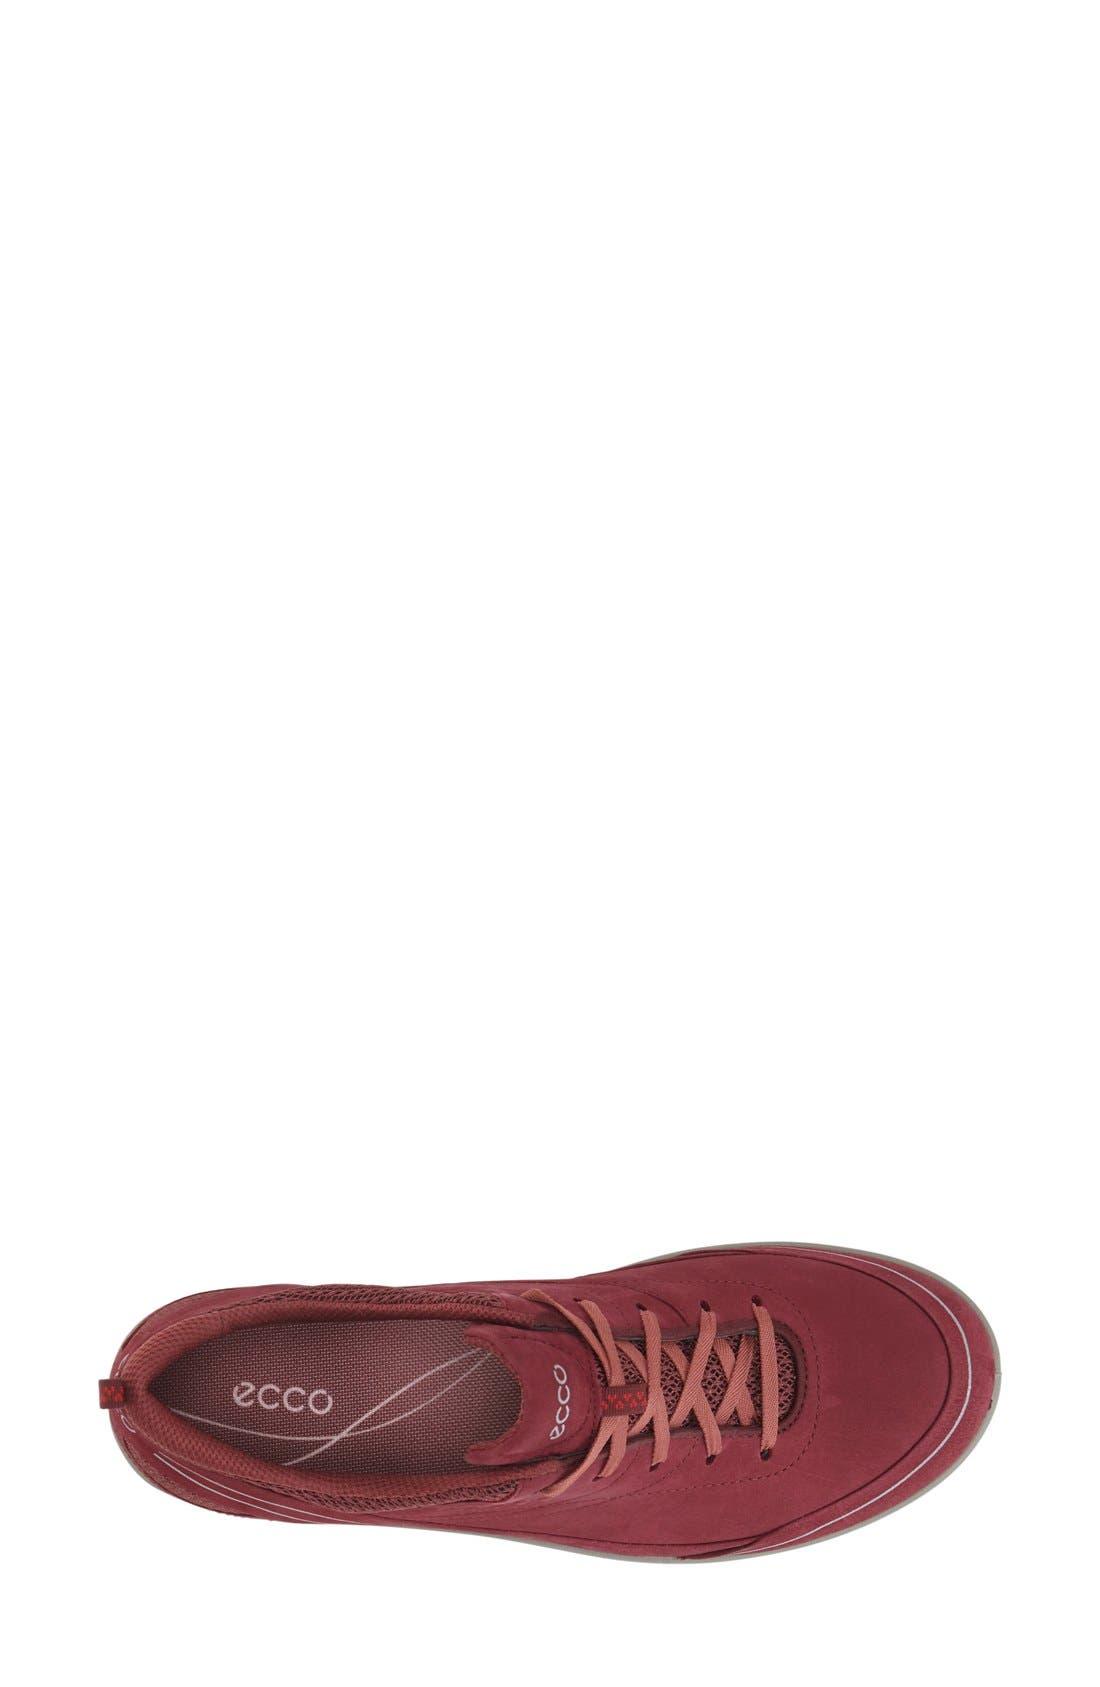 'Arizona' Sneaker,                             Alternate thumbnail 3, color,                             600